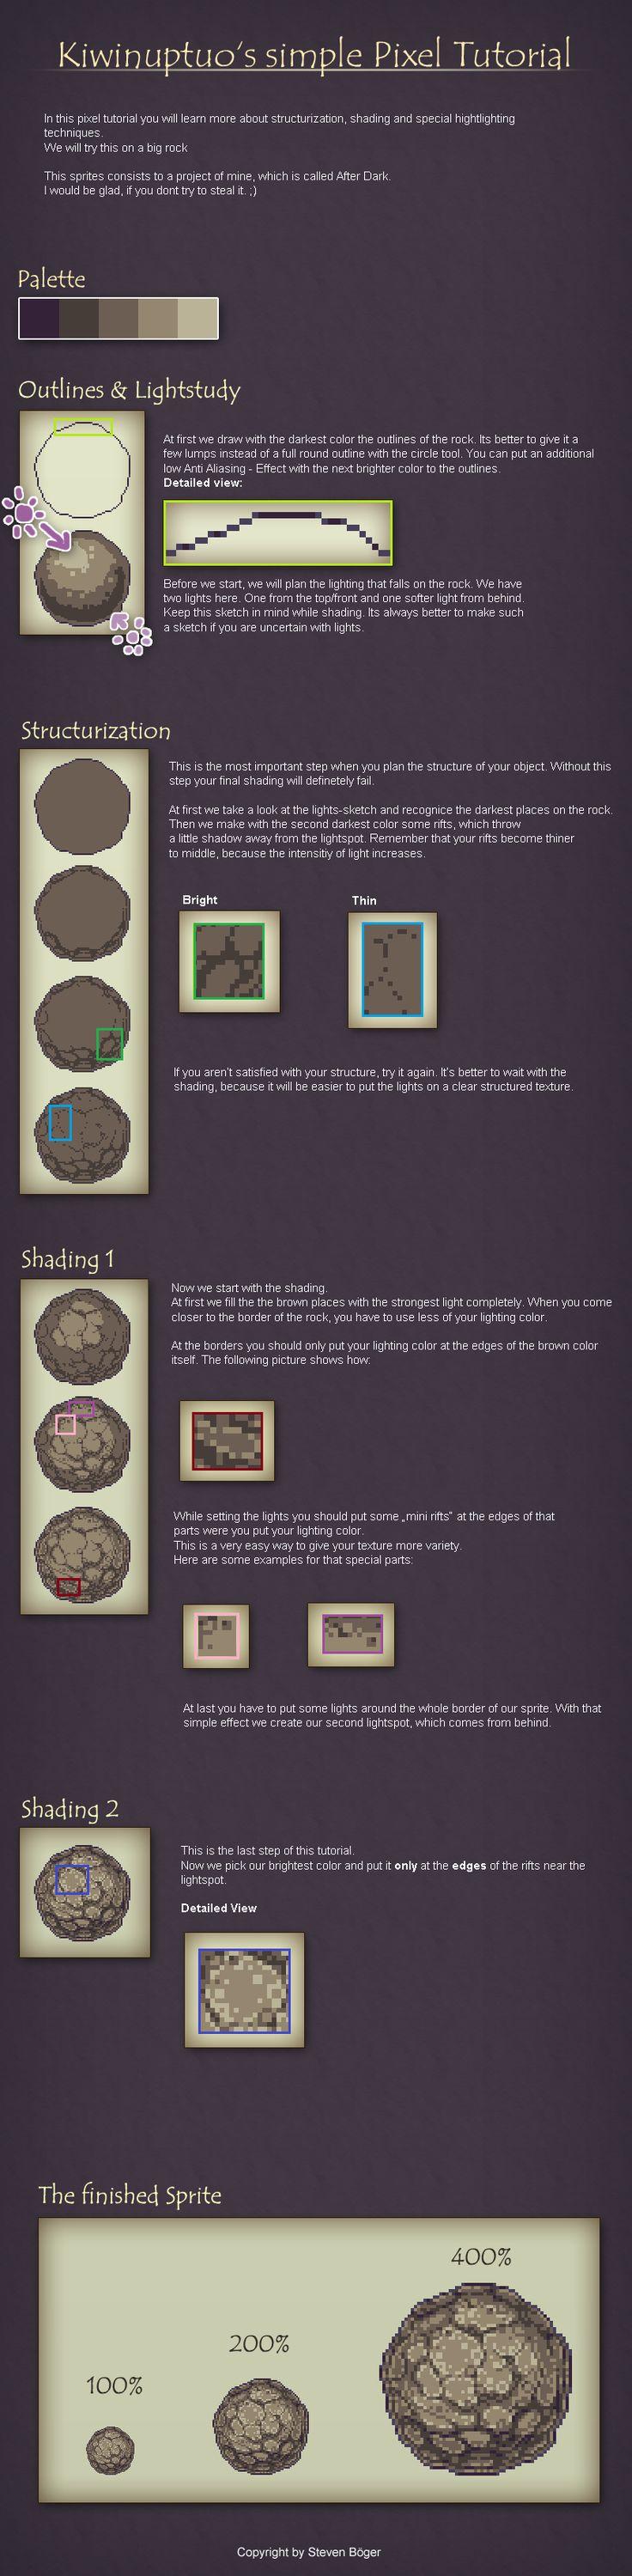 Pixel Art Tutorial - Shading by *Kiwinuptuo on deviantART